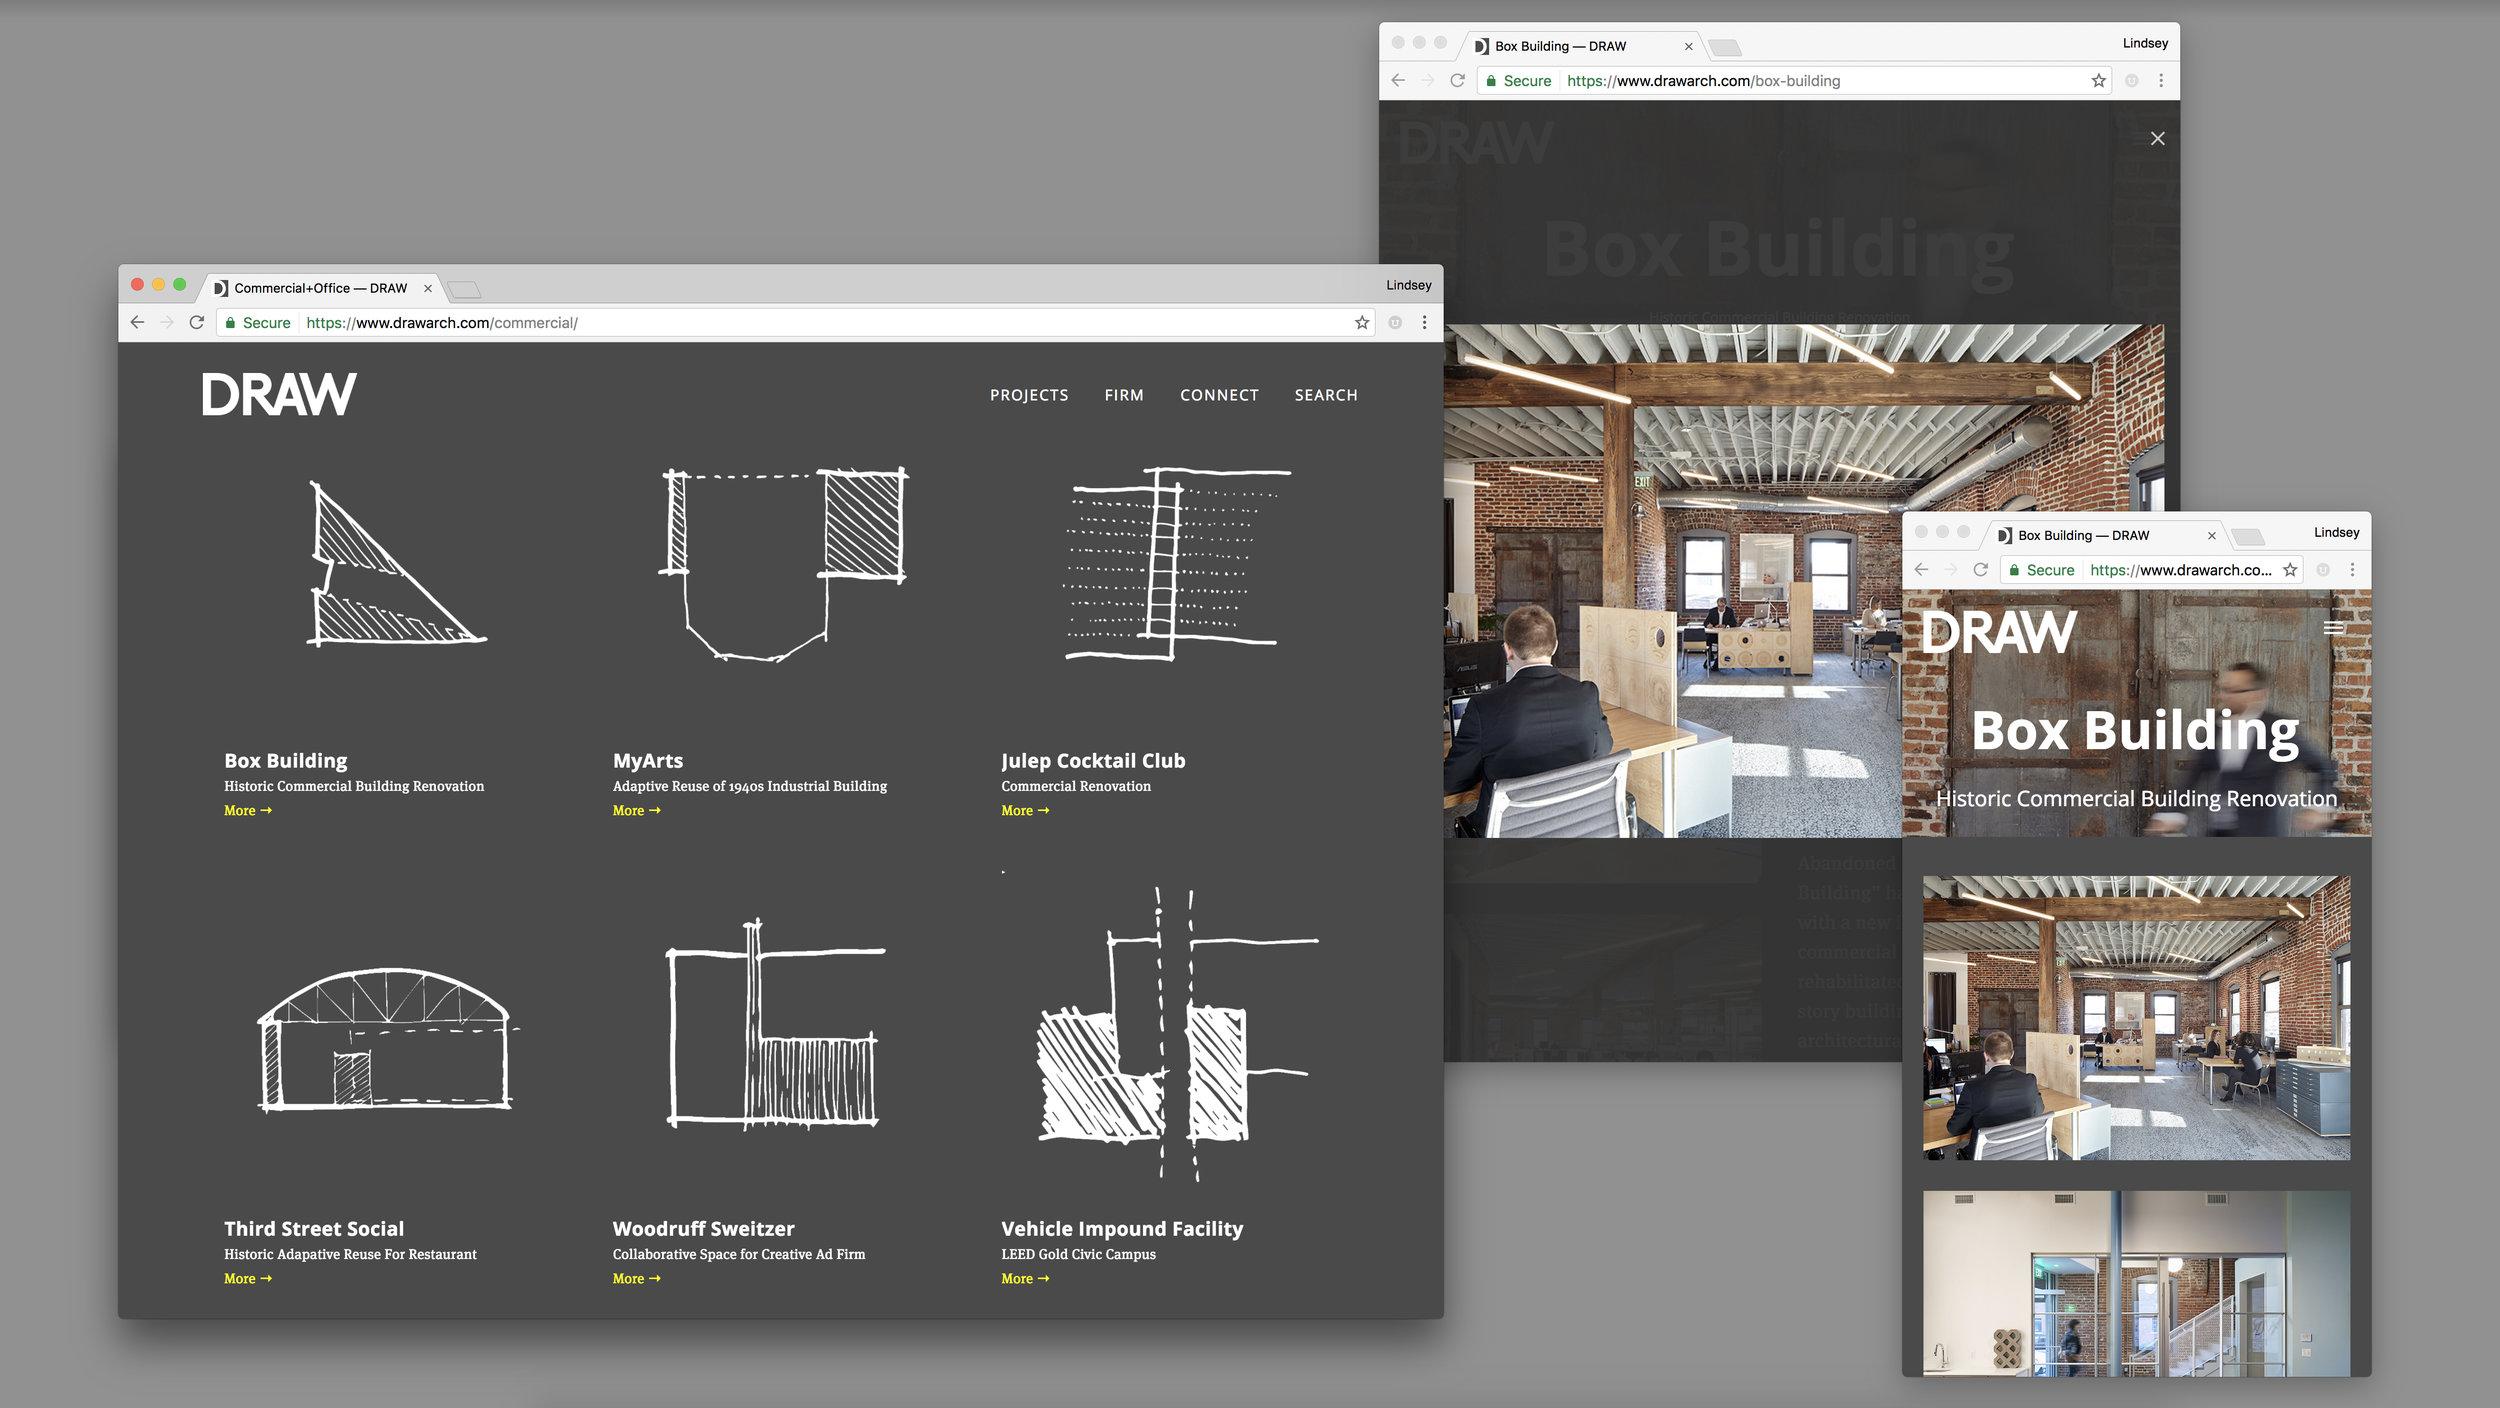 draw-website-2.jpg